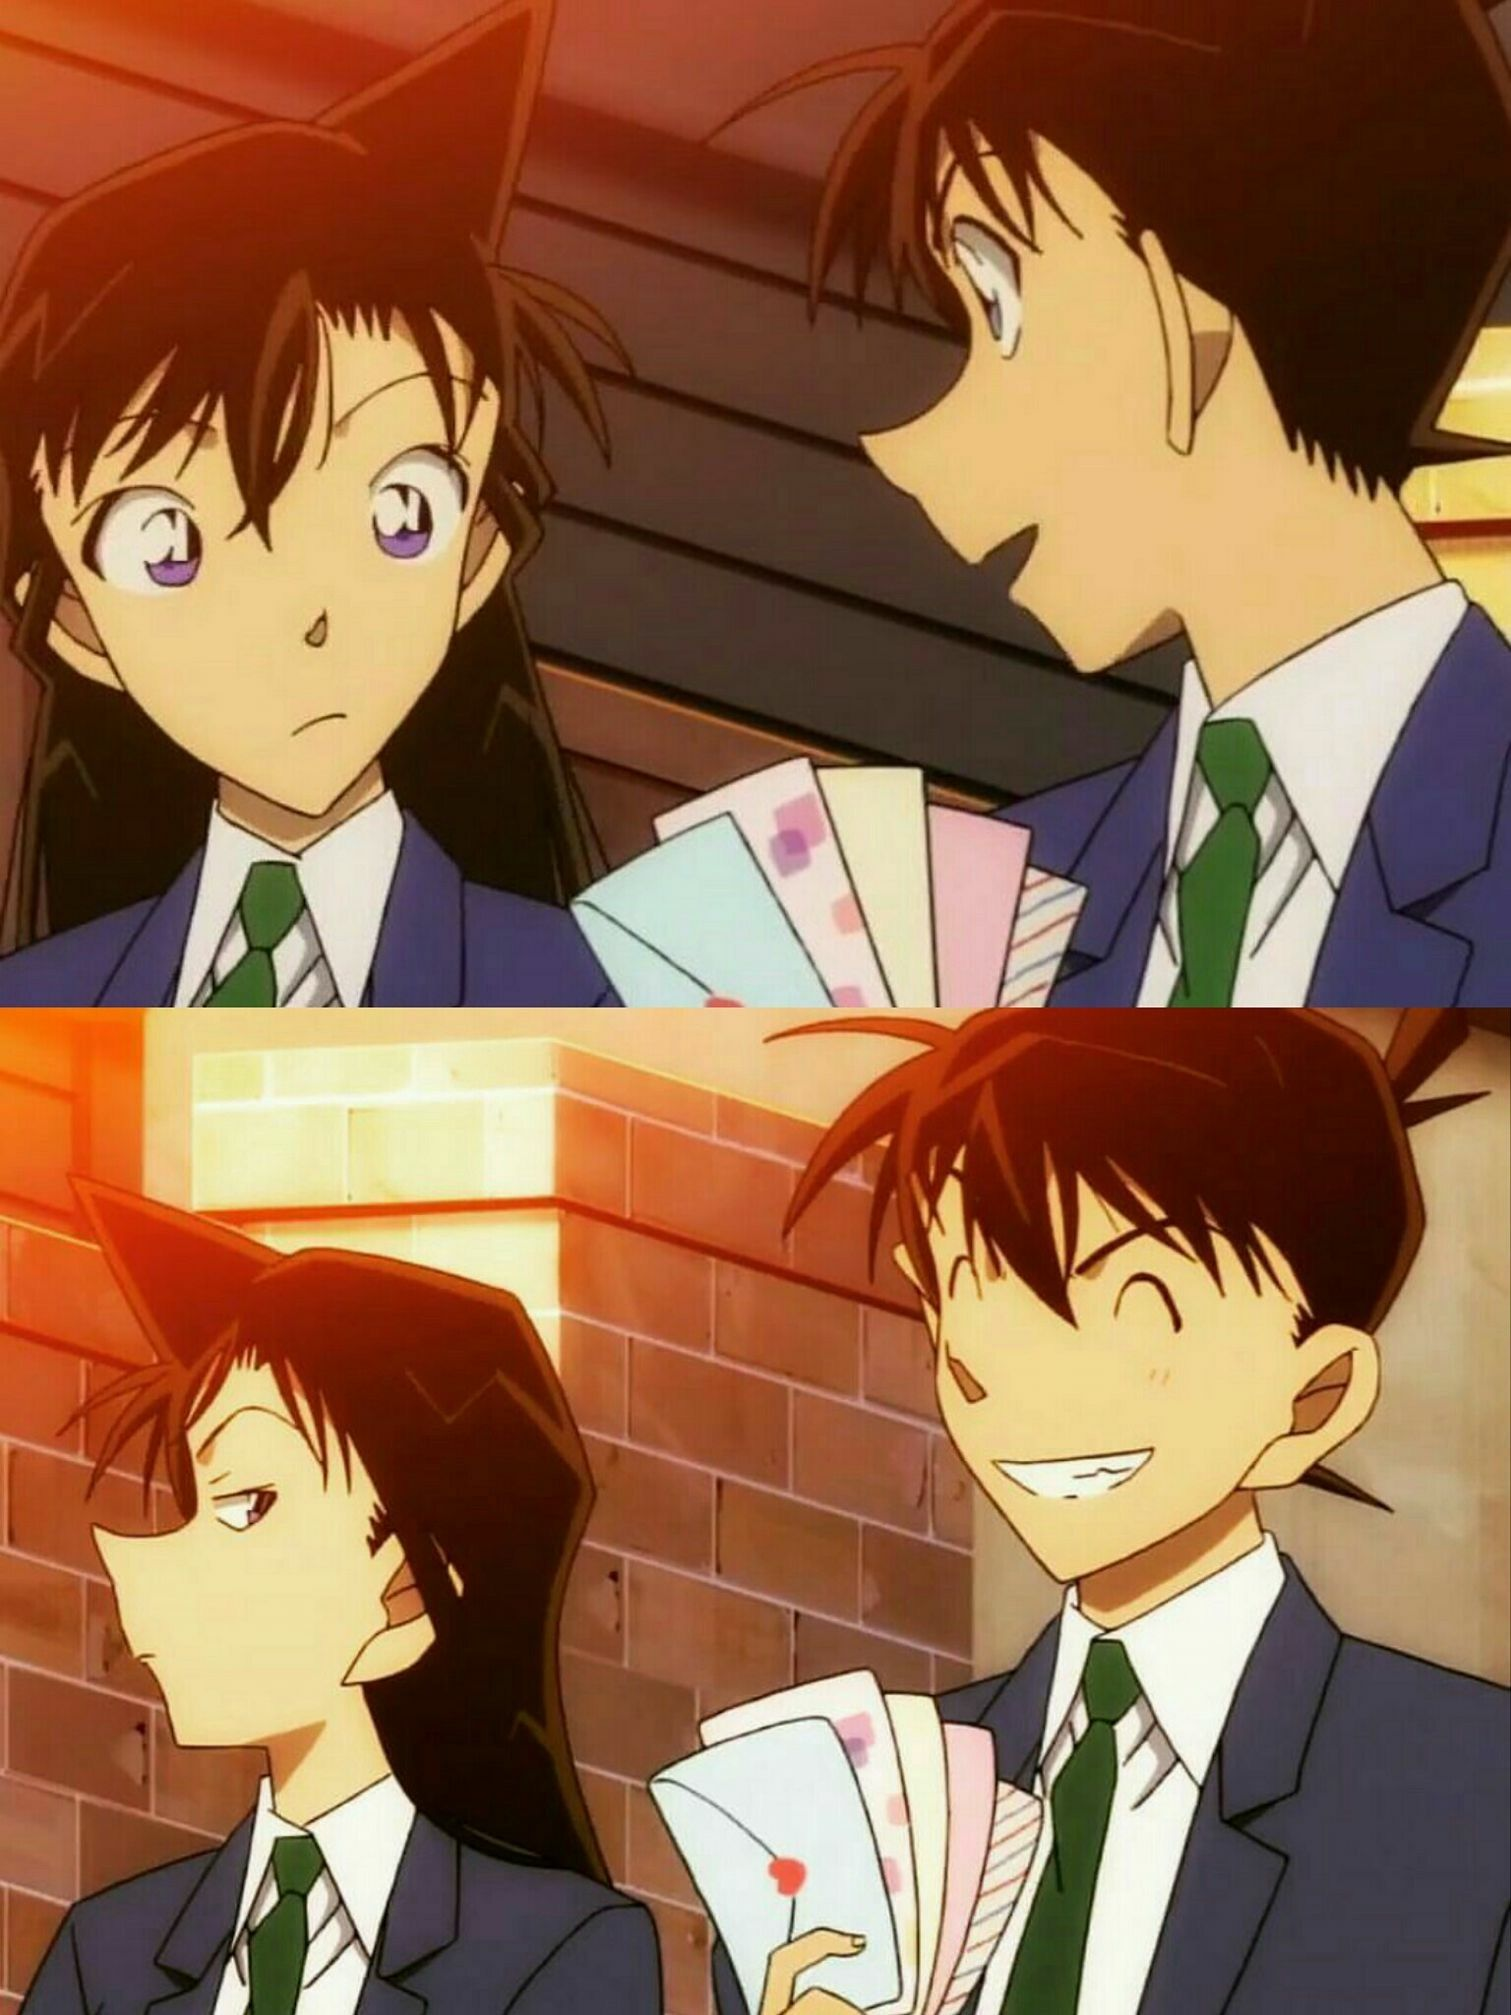 Save Follow Cỏ Kỳ ảo Anime Dễ Thương